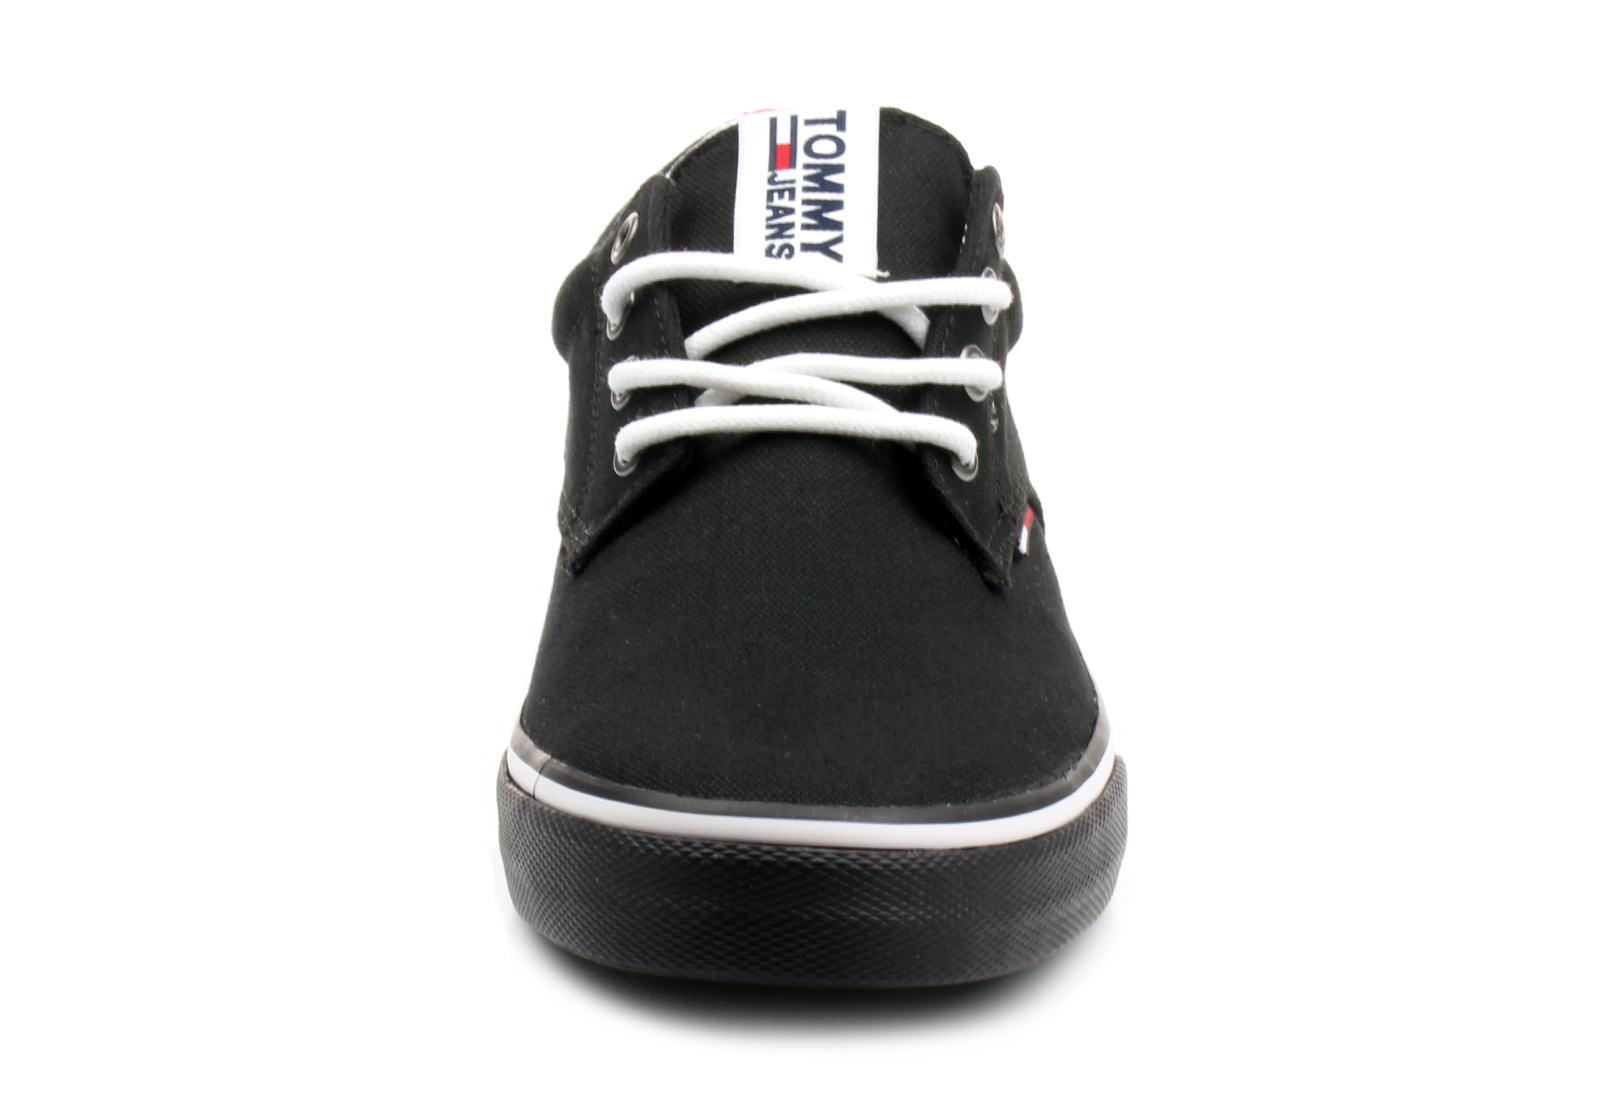 6749dc15da Tommy Hilfiger Cipő - Vic 1d2 - 18S-0001-990 - Office Shoes Magyarország